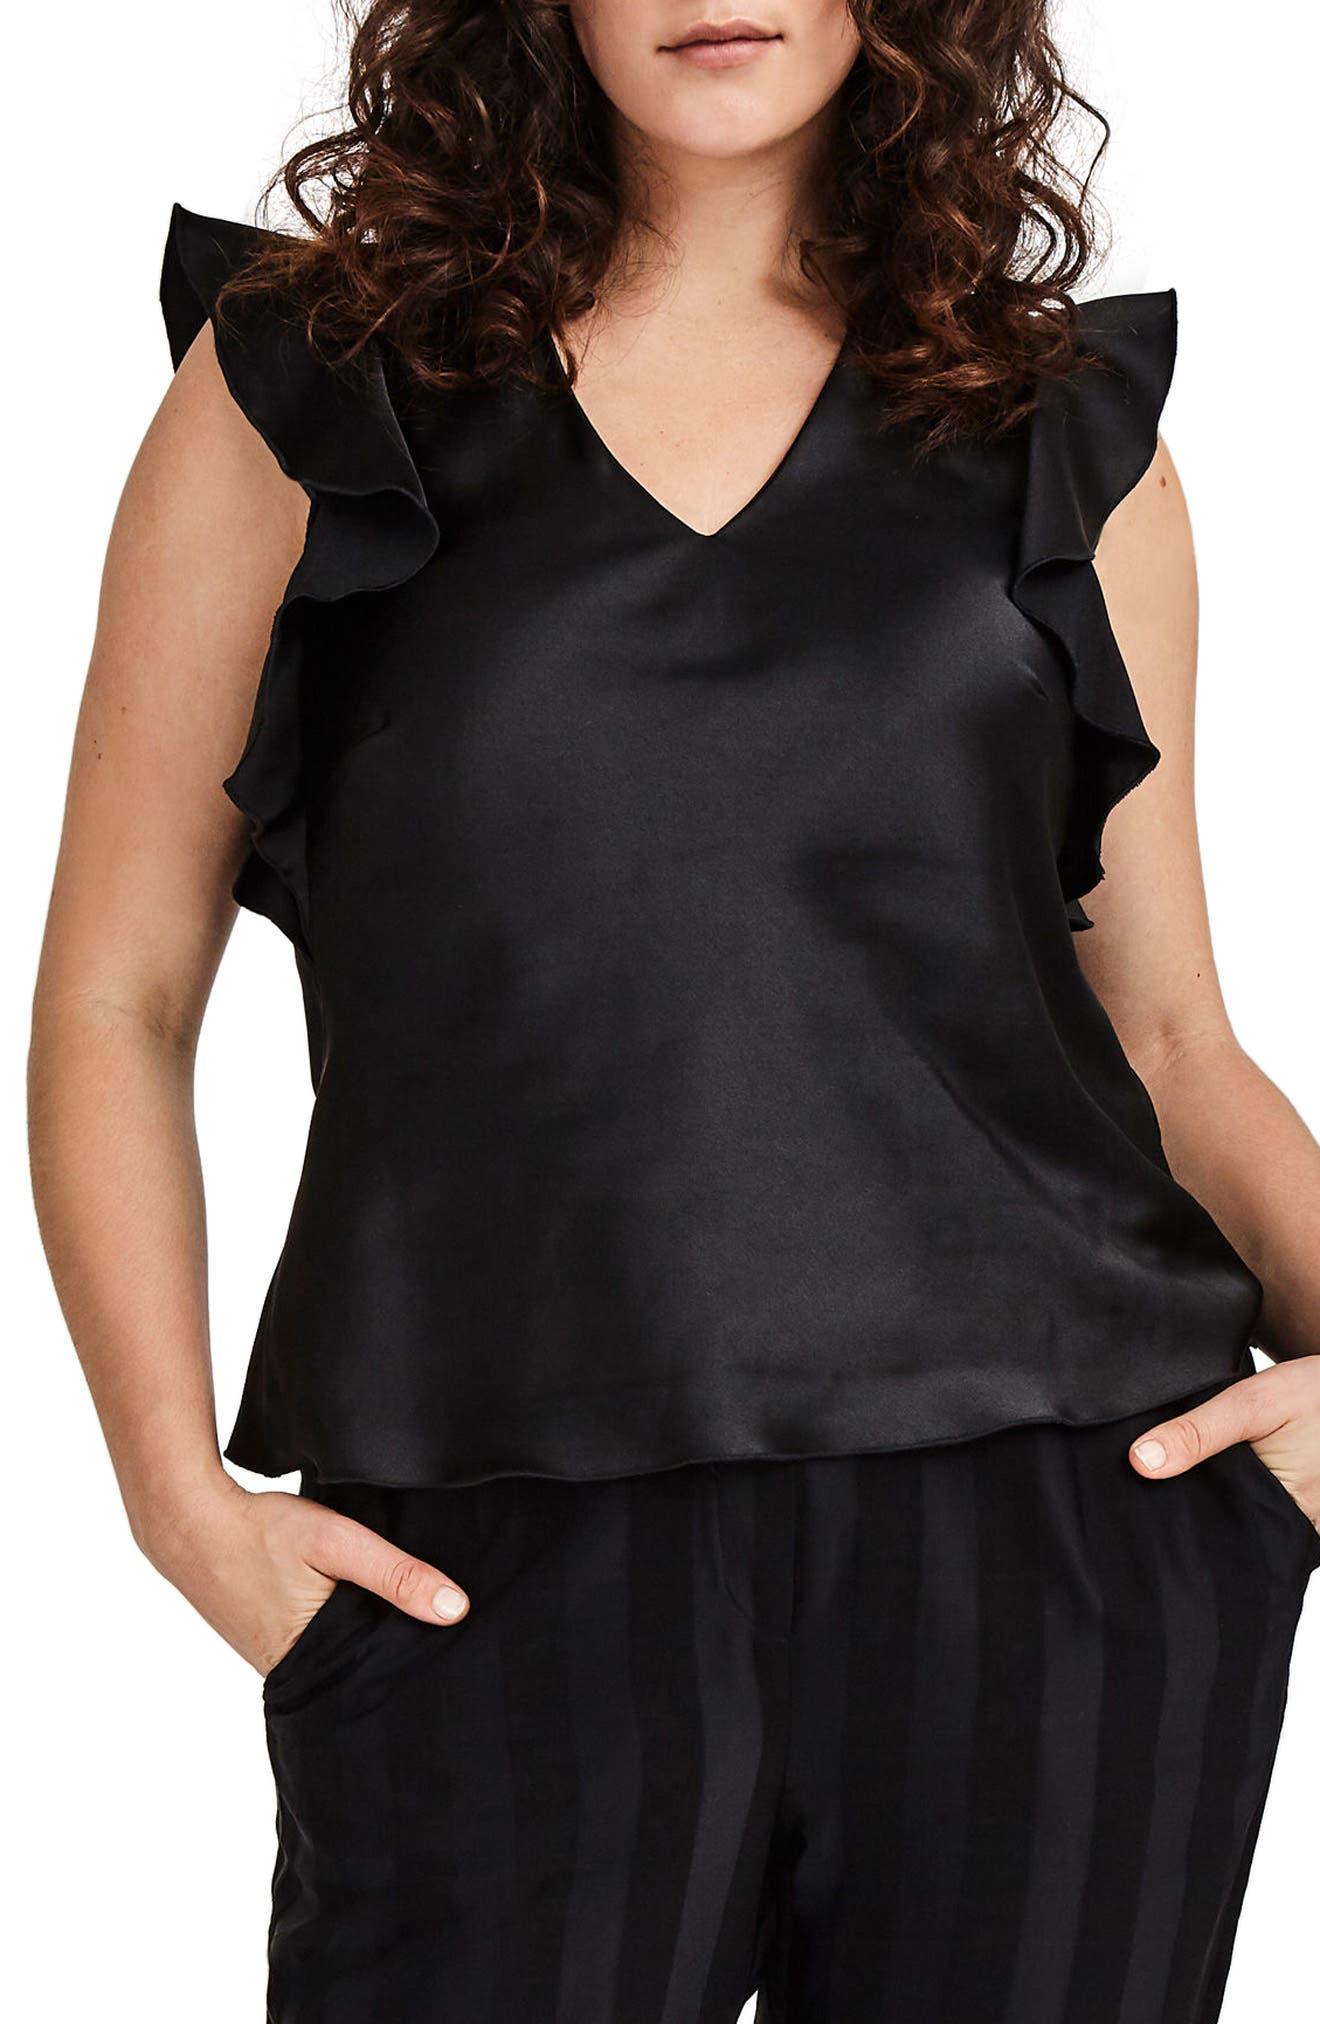 Main Image - ELVI Black Satin Ruffle Top (Plus Size)